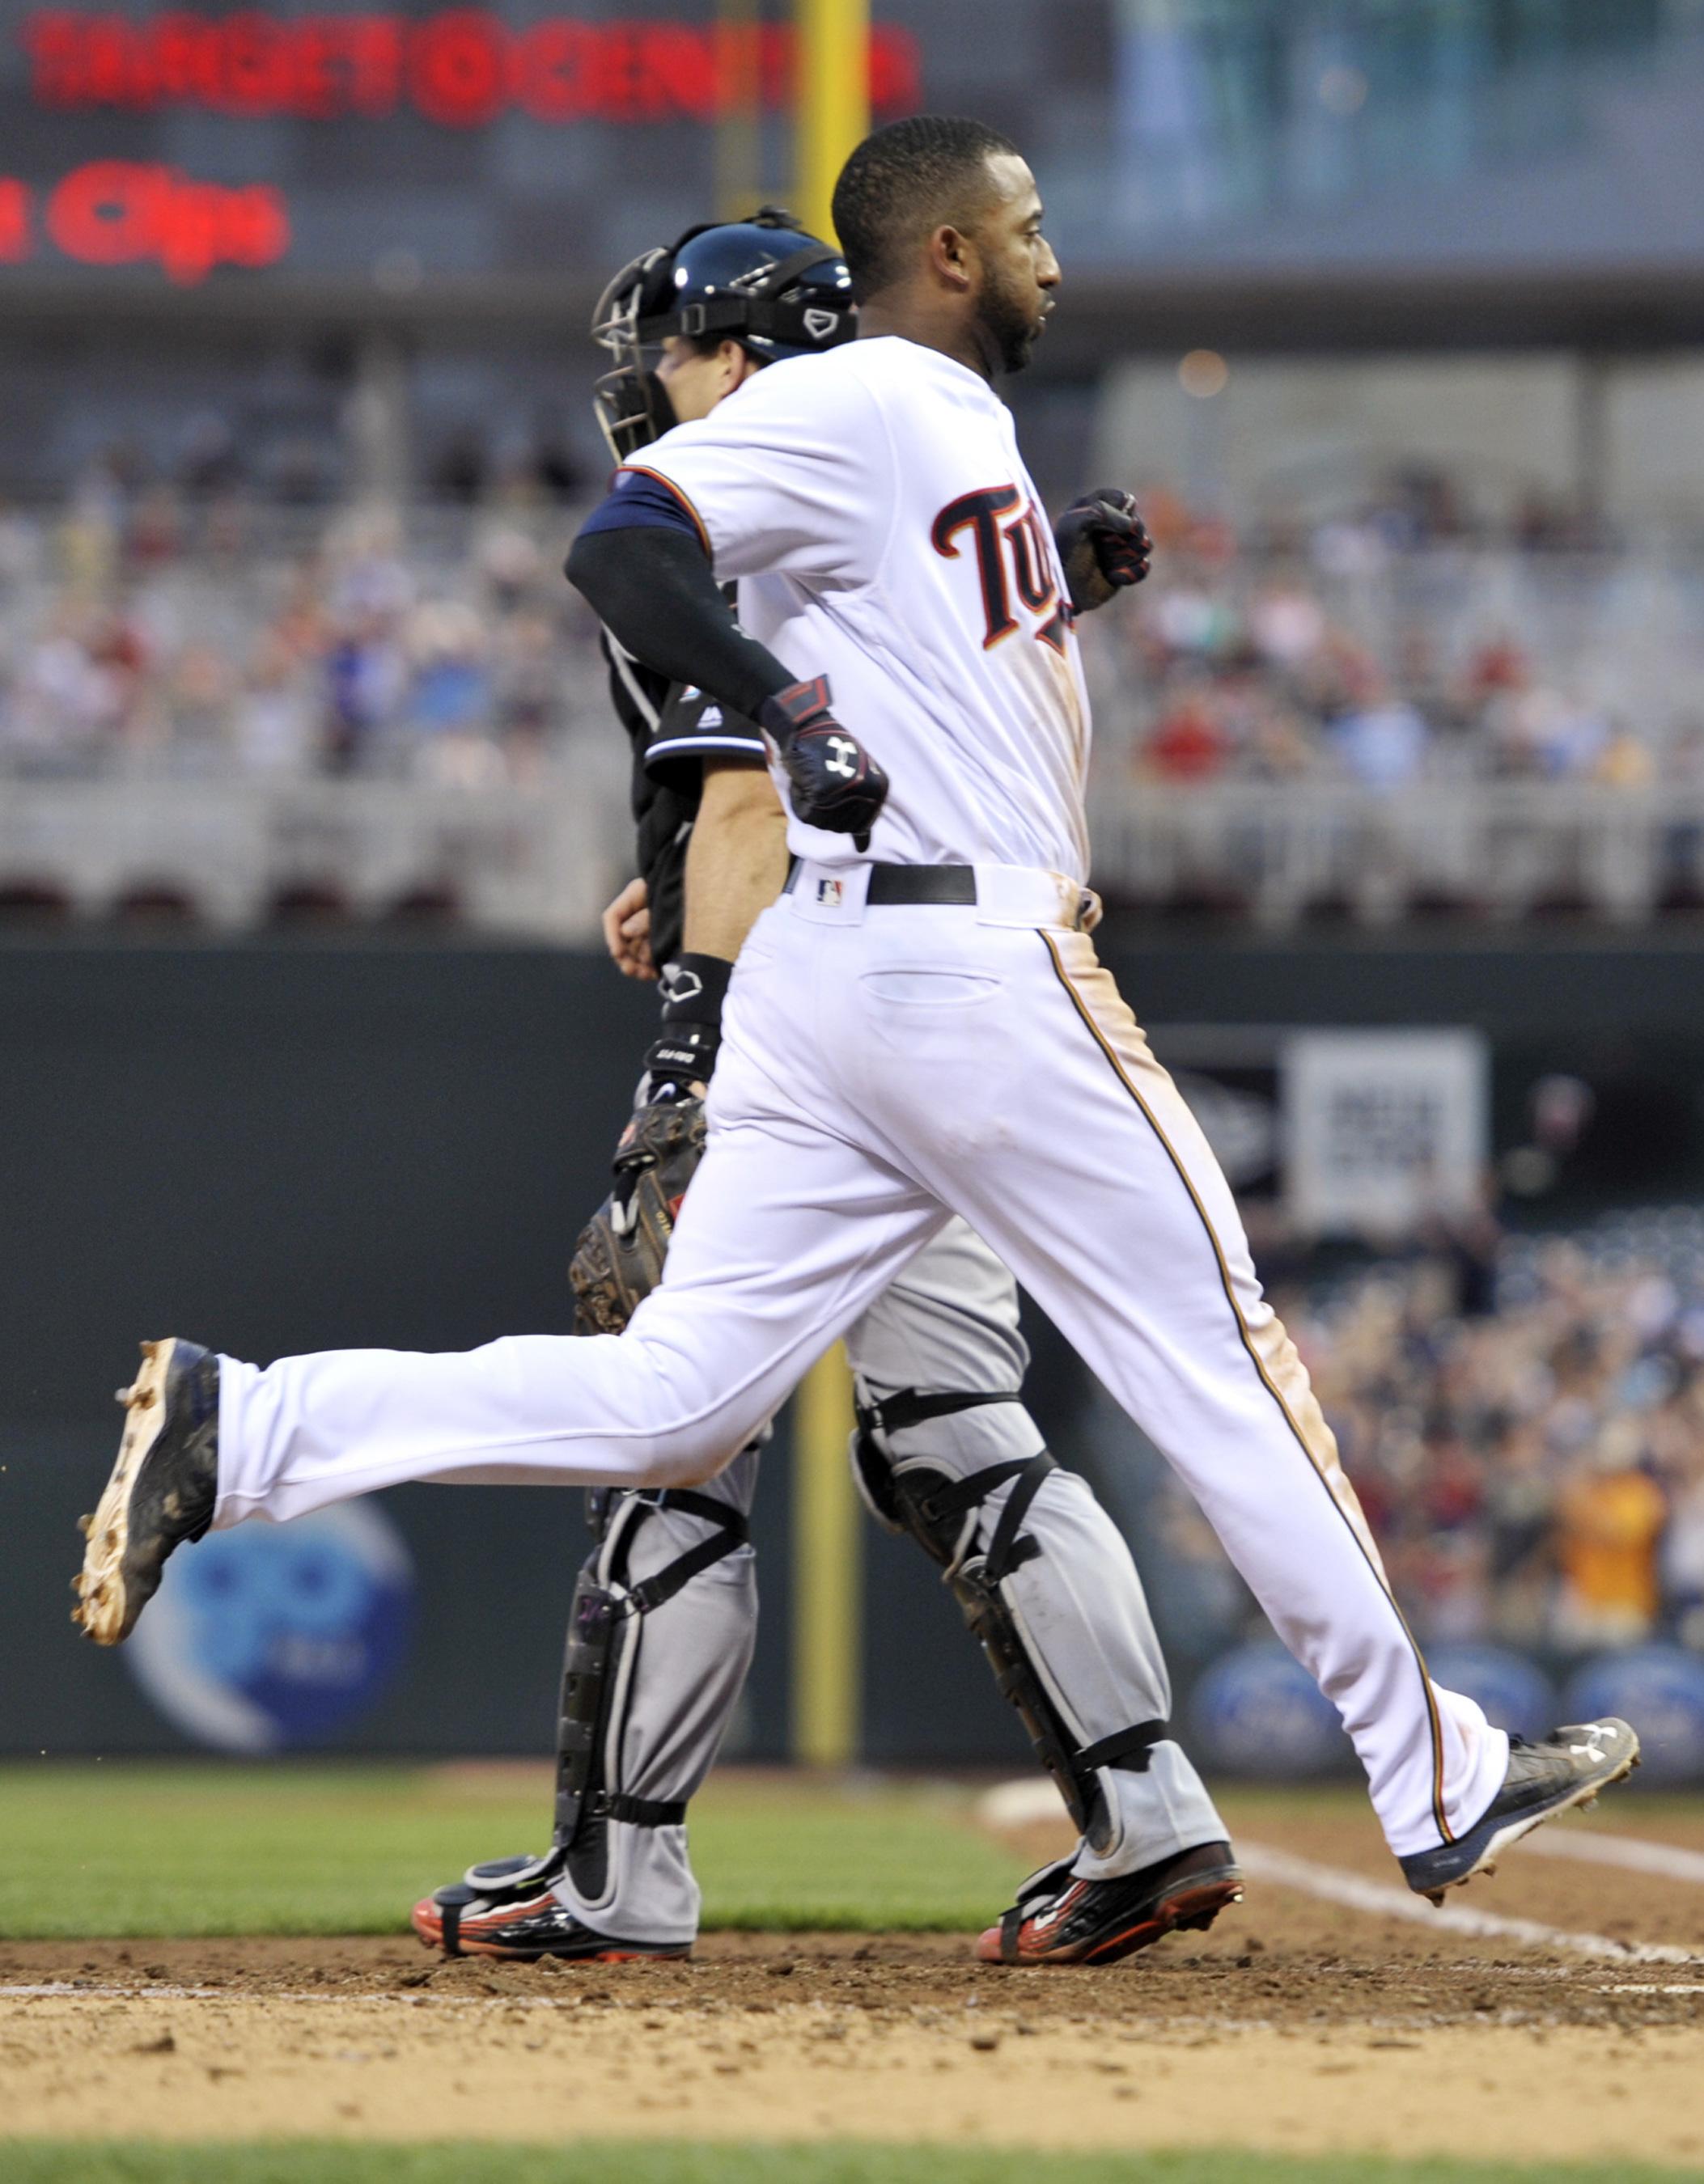 Minnesota Twins' Eduardo Nunez scores during the sixth inning of a baseball game against the Miami Marlins on Thursday, June 9, 2016, in Minneapolis. (AP Photo/Jim Mone)